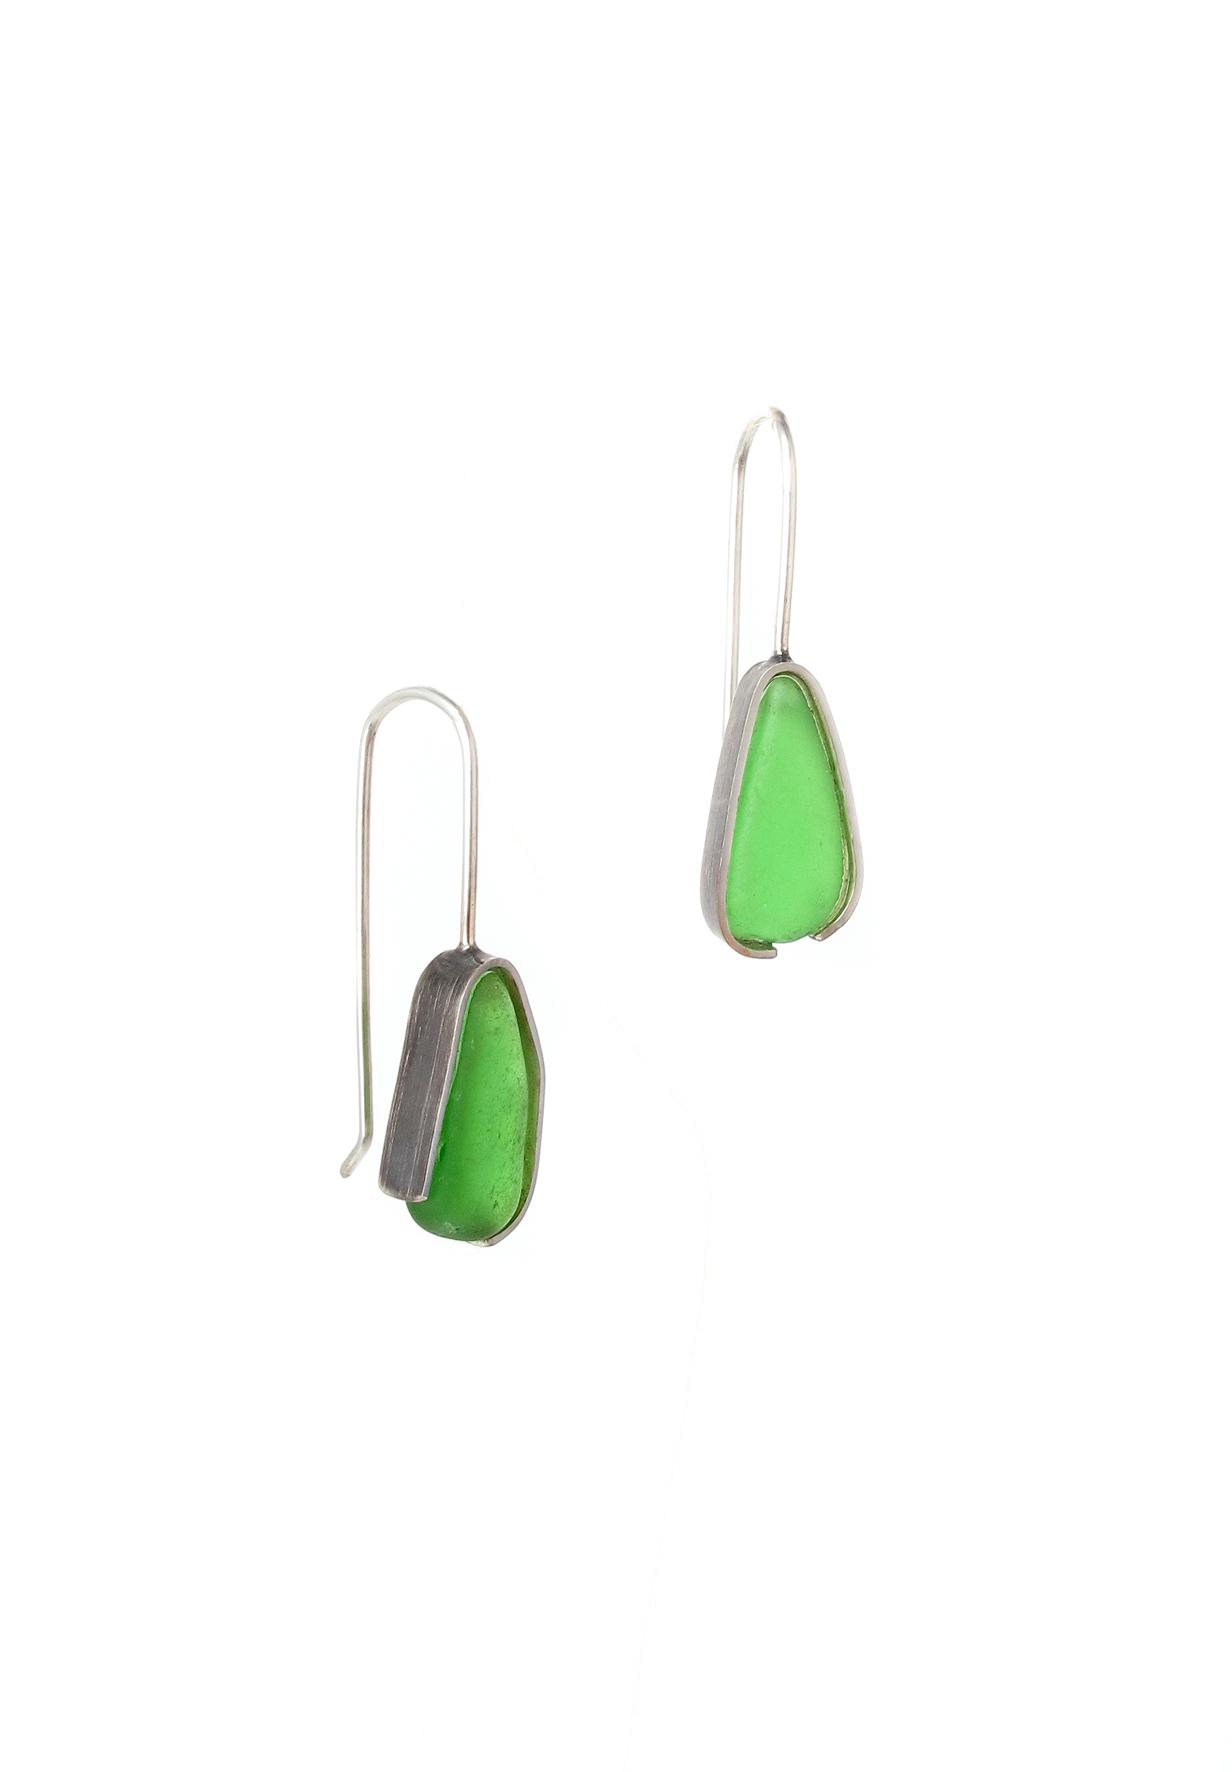 sea glass green er 1-2.jpg